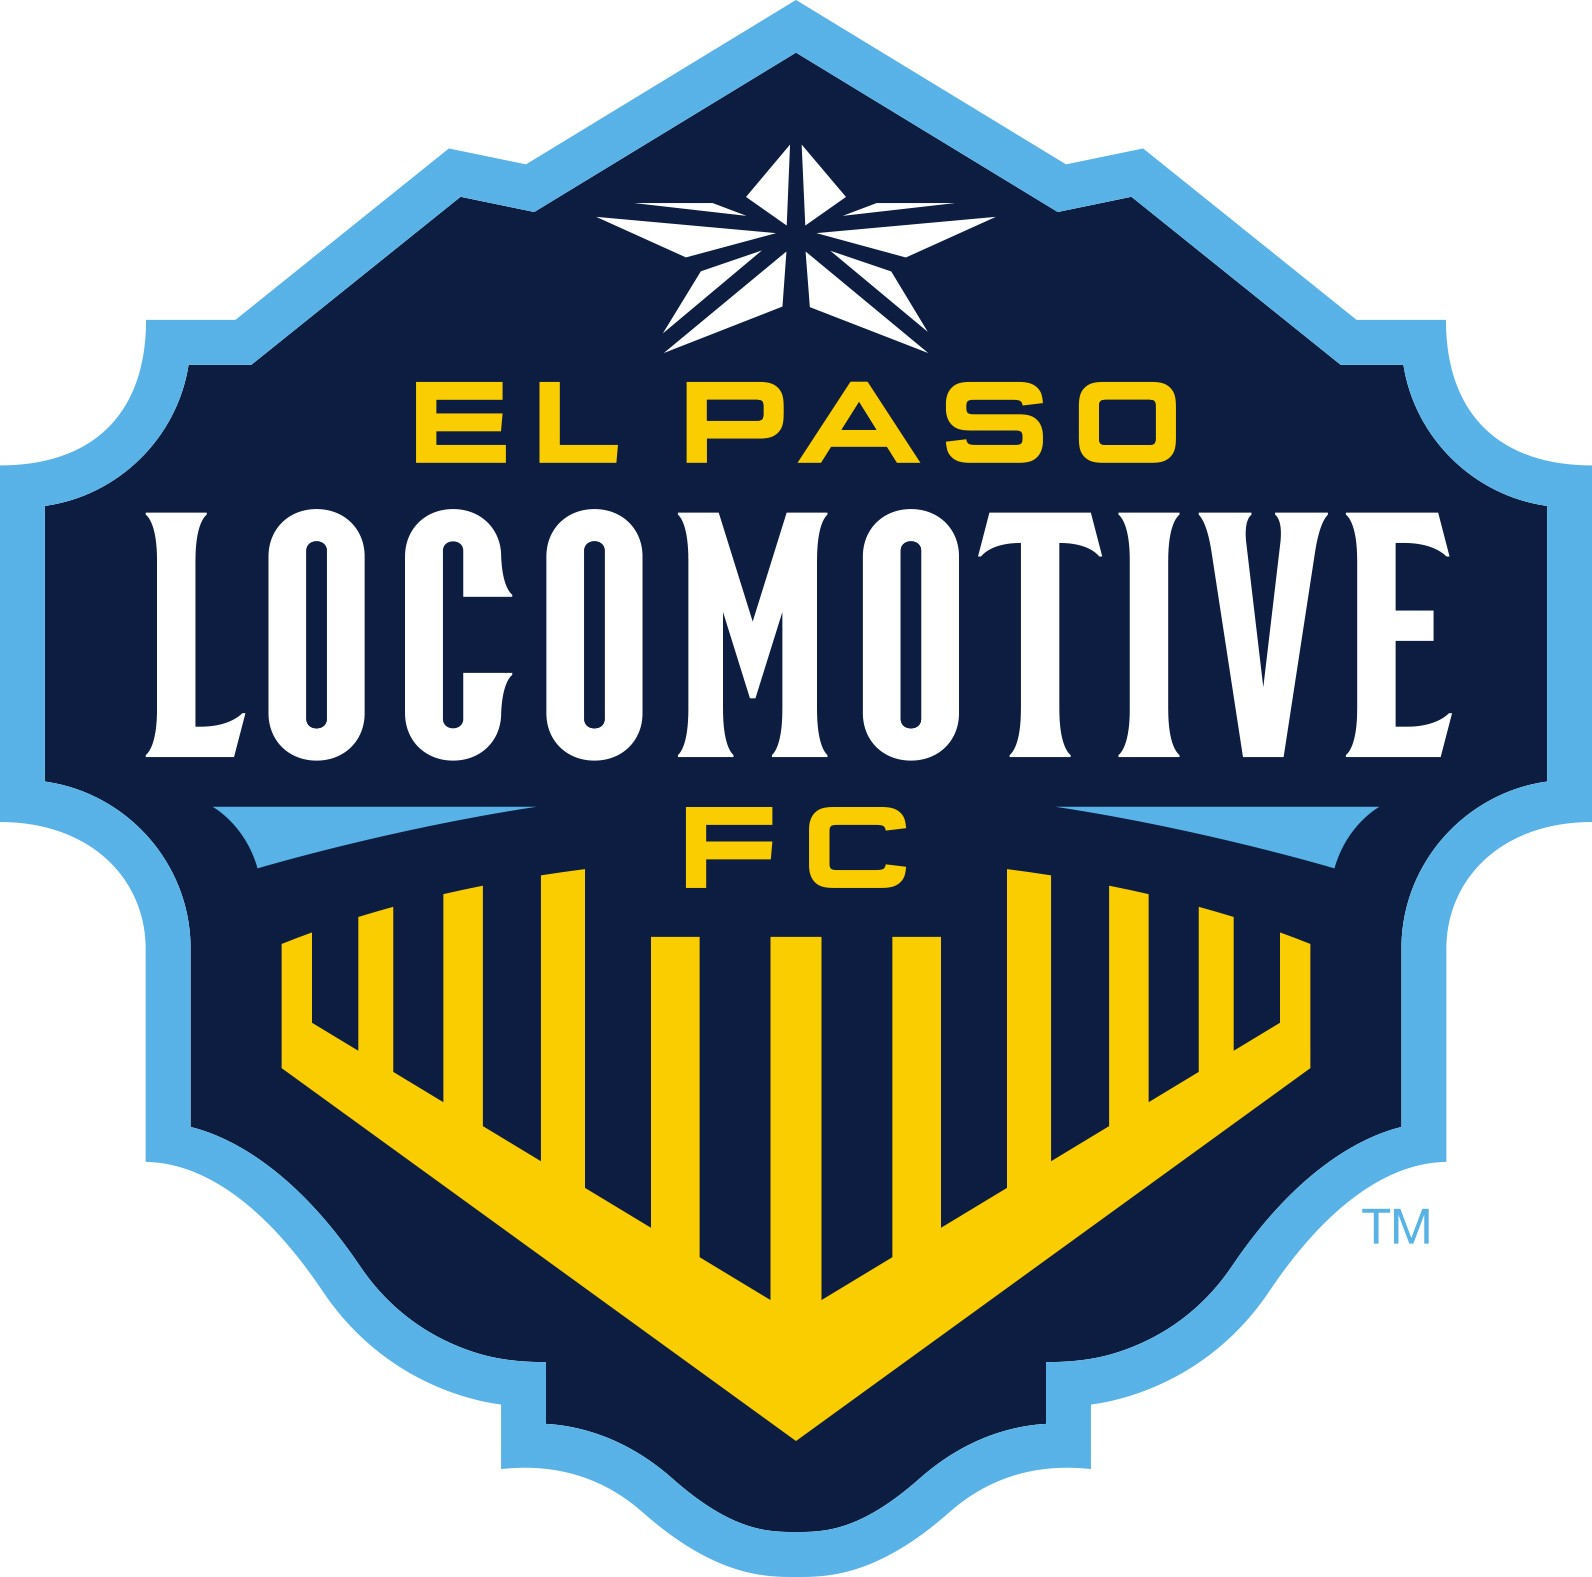 Paso Locomotive FC